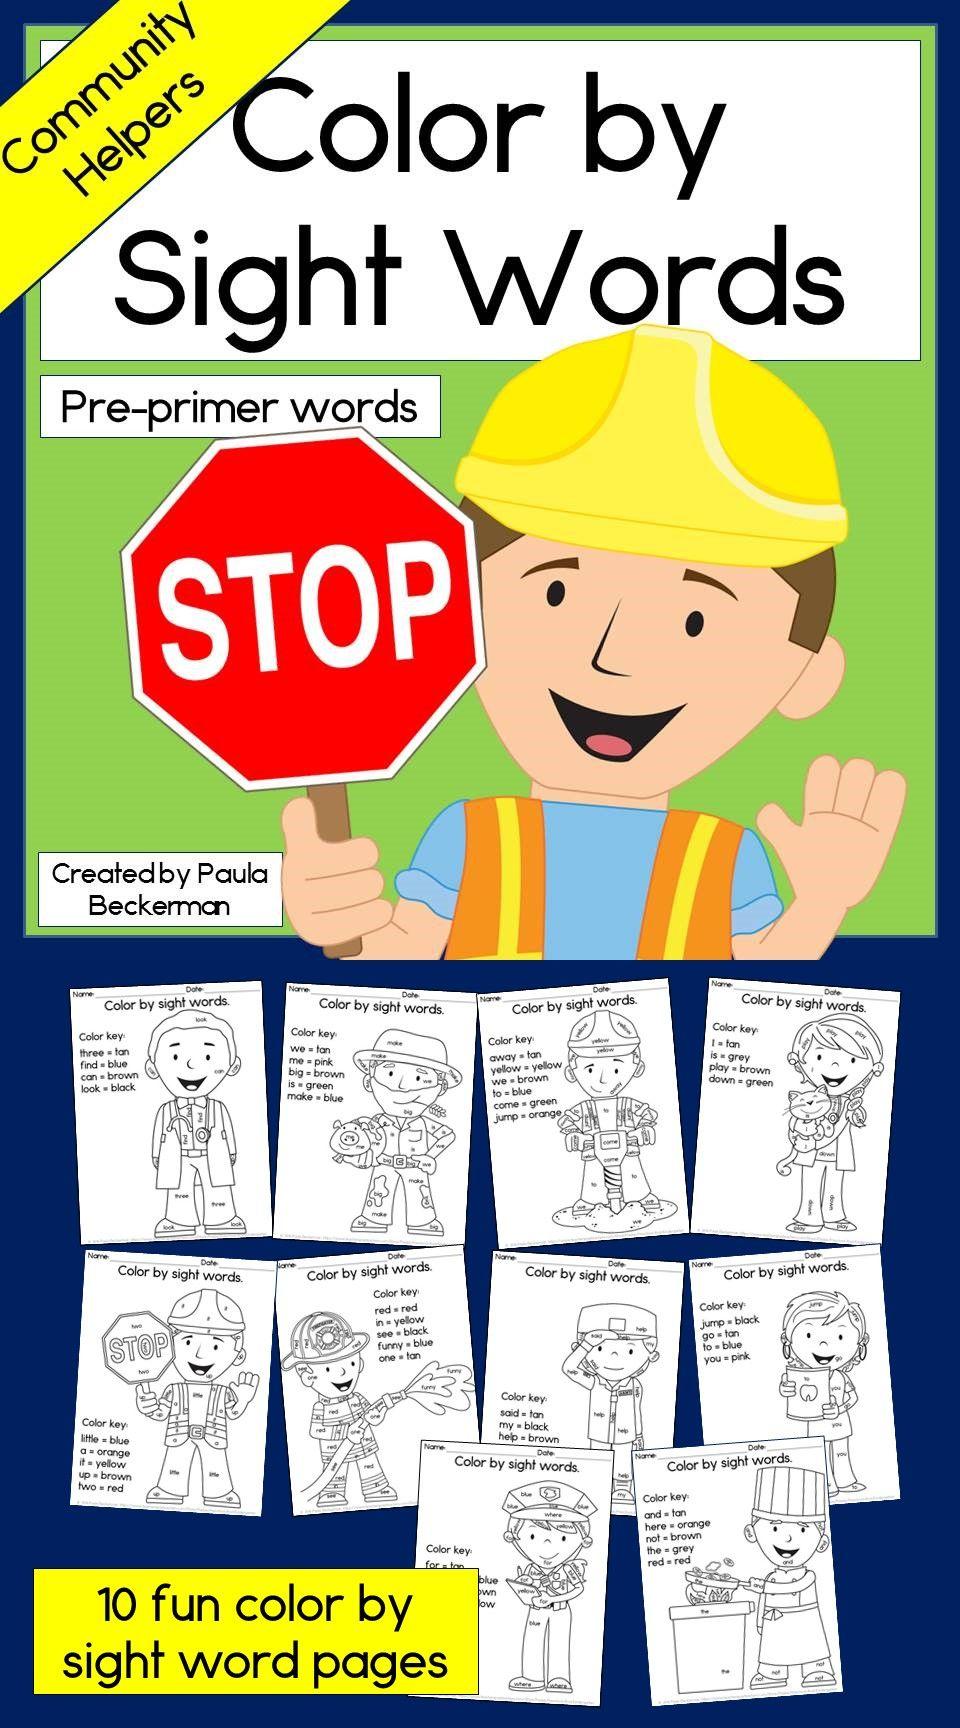 Community Helpers Color By Sight Words Reading Activity For Kindergarten Pre Primer Words Community Helpers Pre Primer Words Pre Primer Sight Words Worksheets [ 1728 x 960 Pixel ]